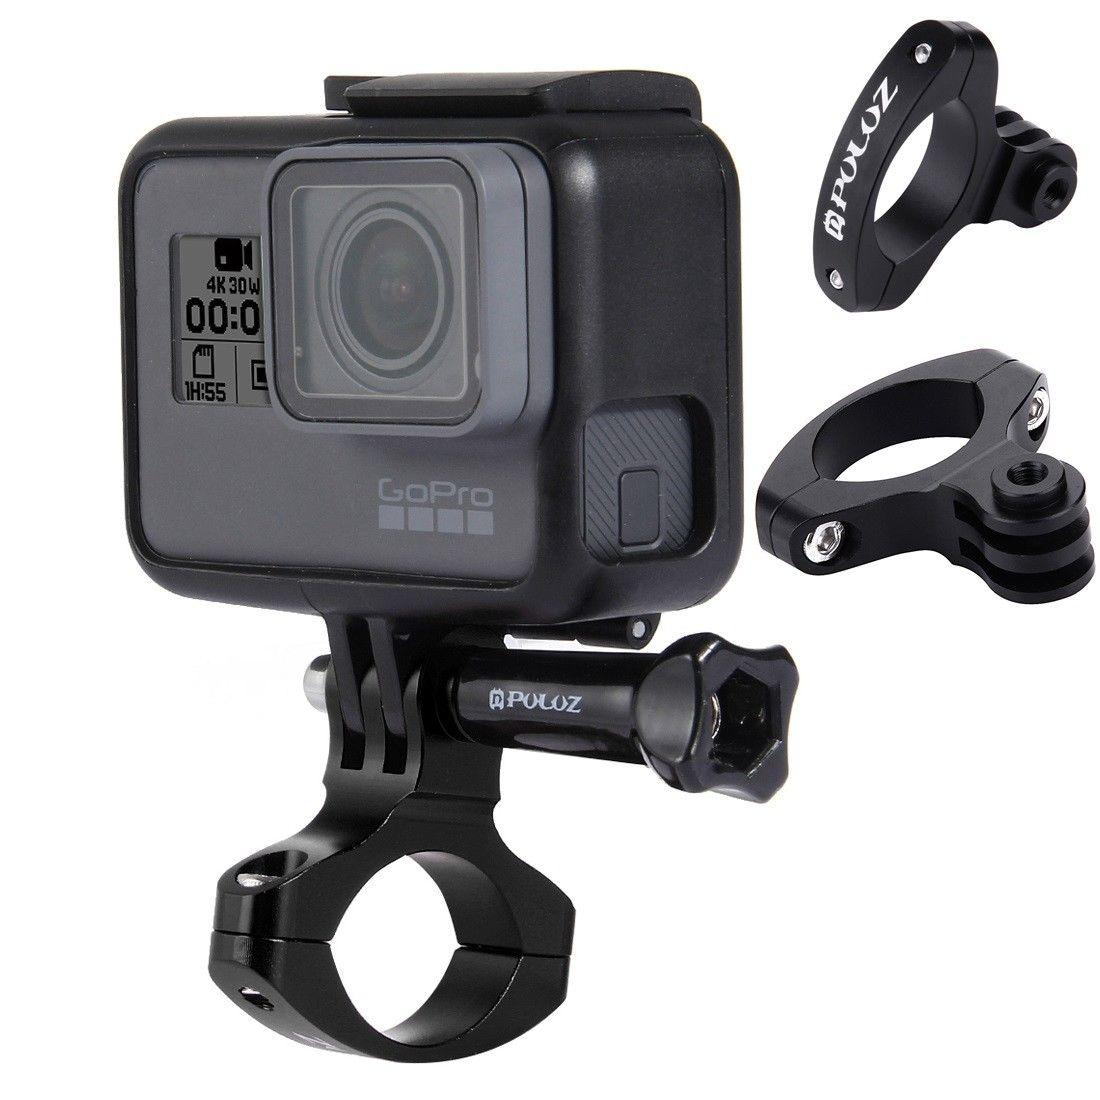 Bike Bicycle Handlebar Mount Clamp for GoPro HERO 6 5/4/three/2/1 Cameras 31.8mm